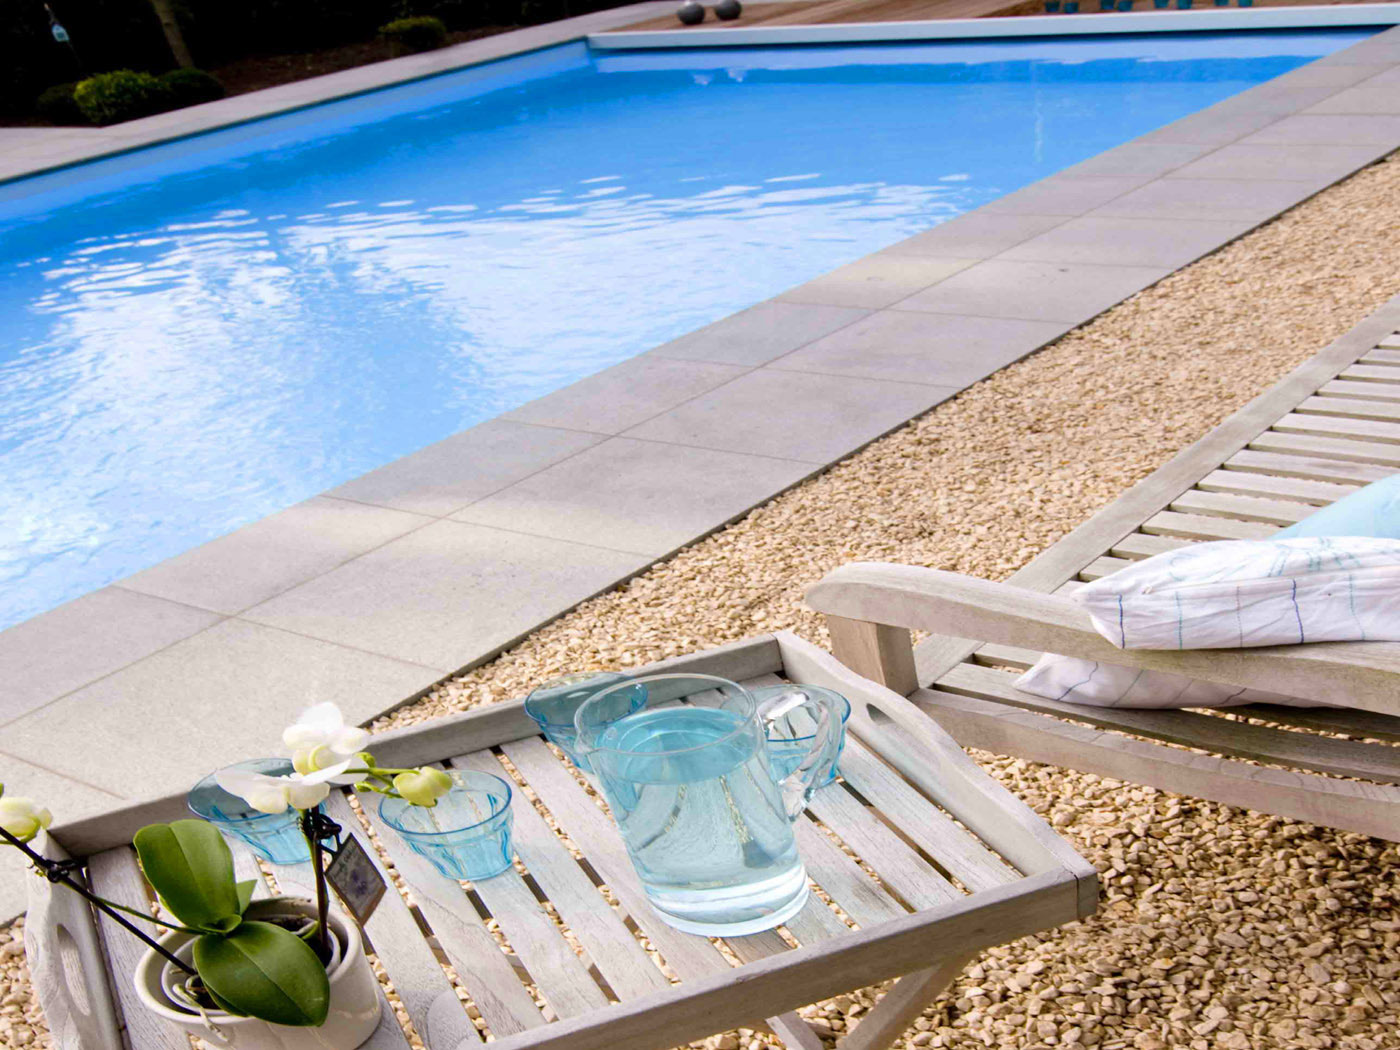 pool farbe alkorplan 2000 adriablau pool more gmbh folien poolbau nieder sterreich wien. Black Bedroom Furniture Sets. Home Design Ideas